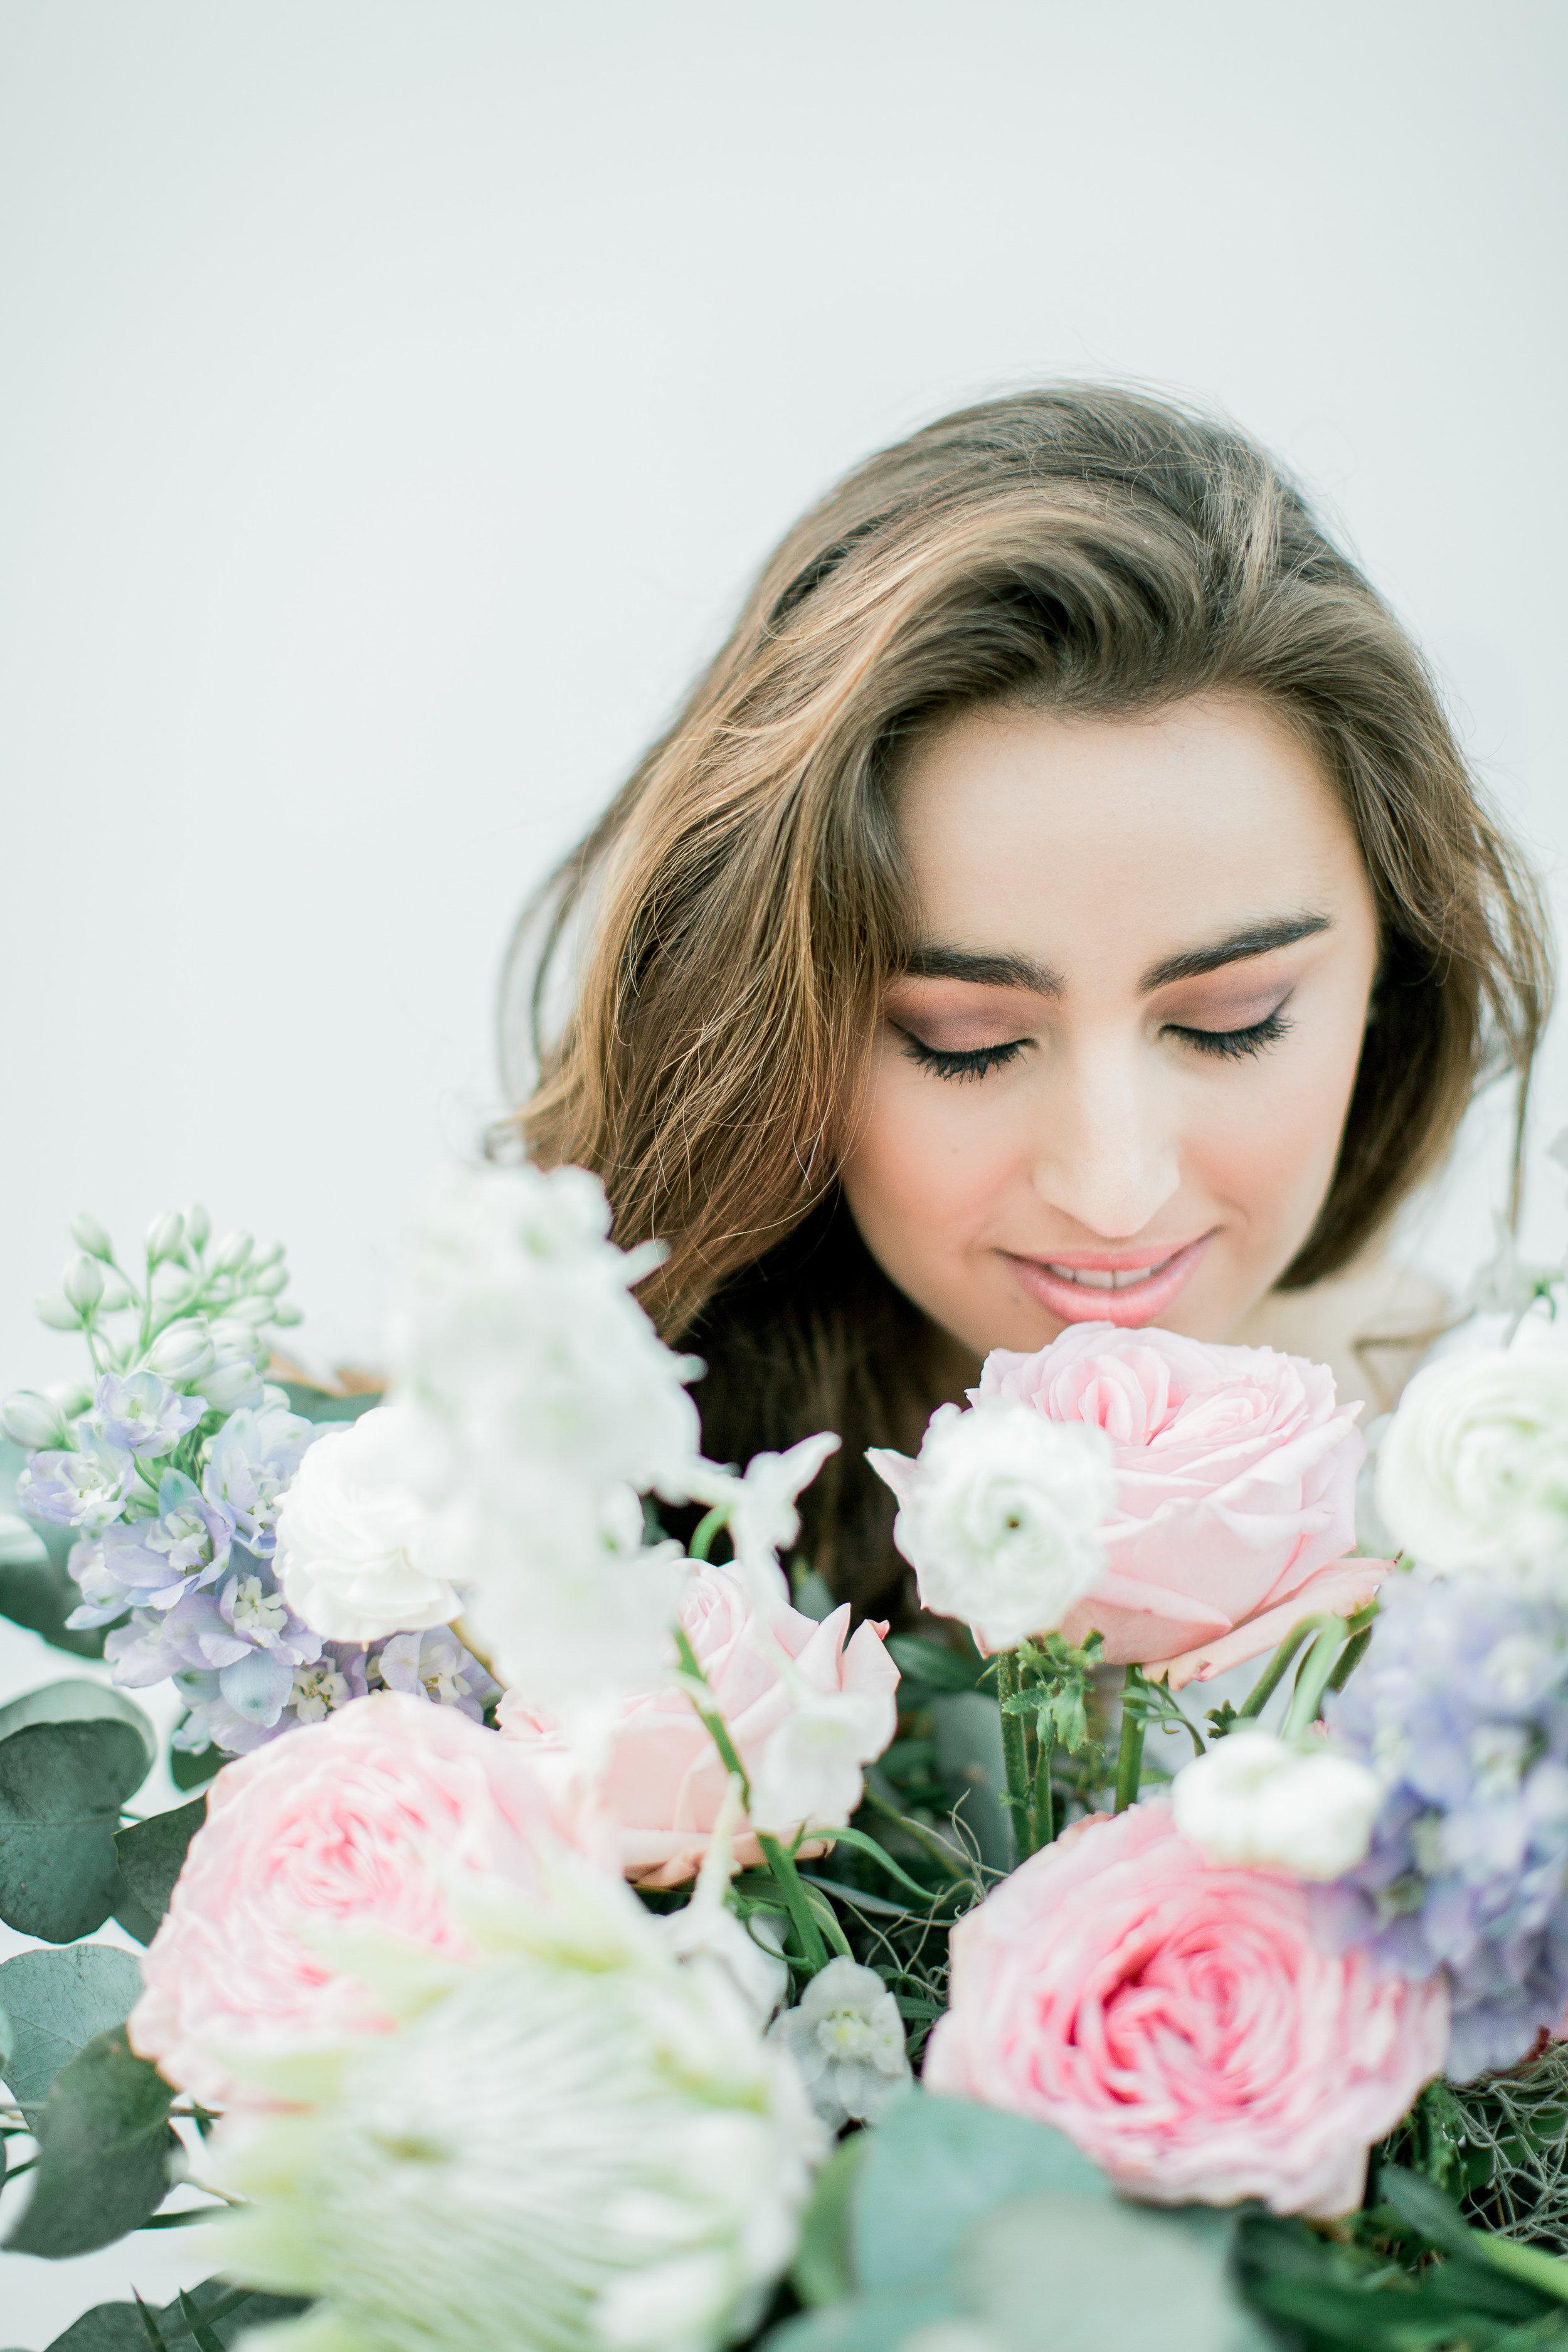 gauteng wedding photographer clareece smit24.jpg